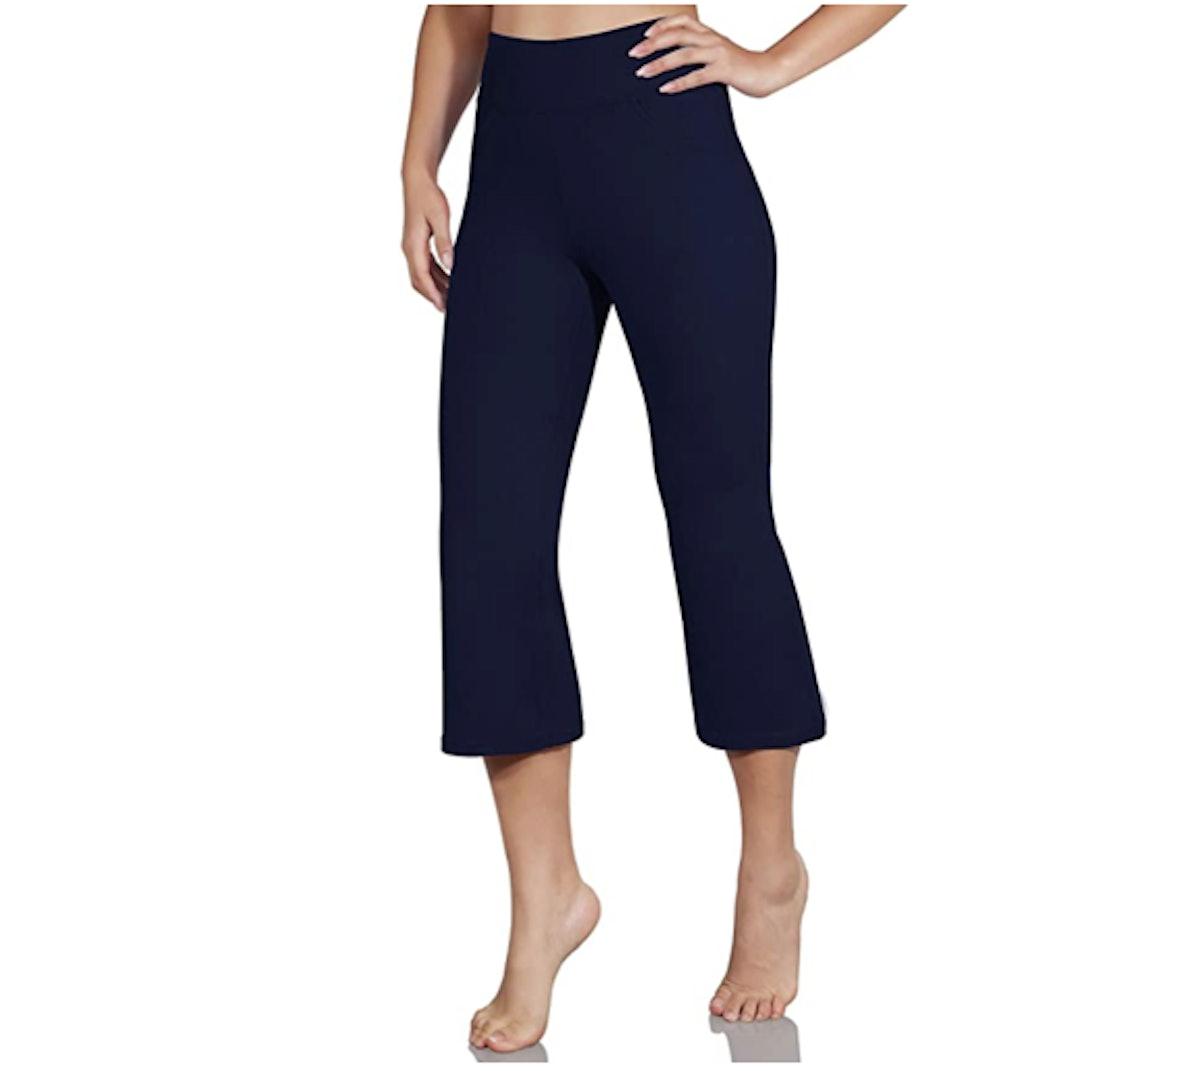 ODODOS Cropped Bootcut Yoga Pants